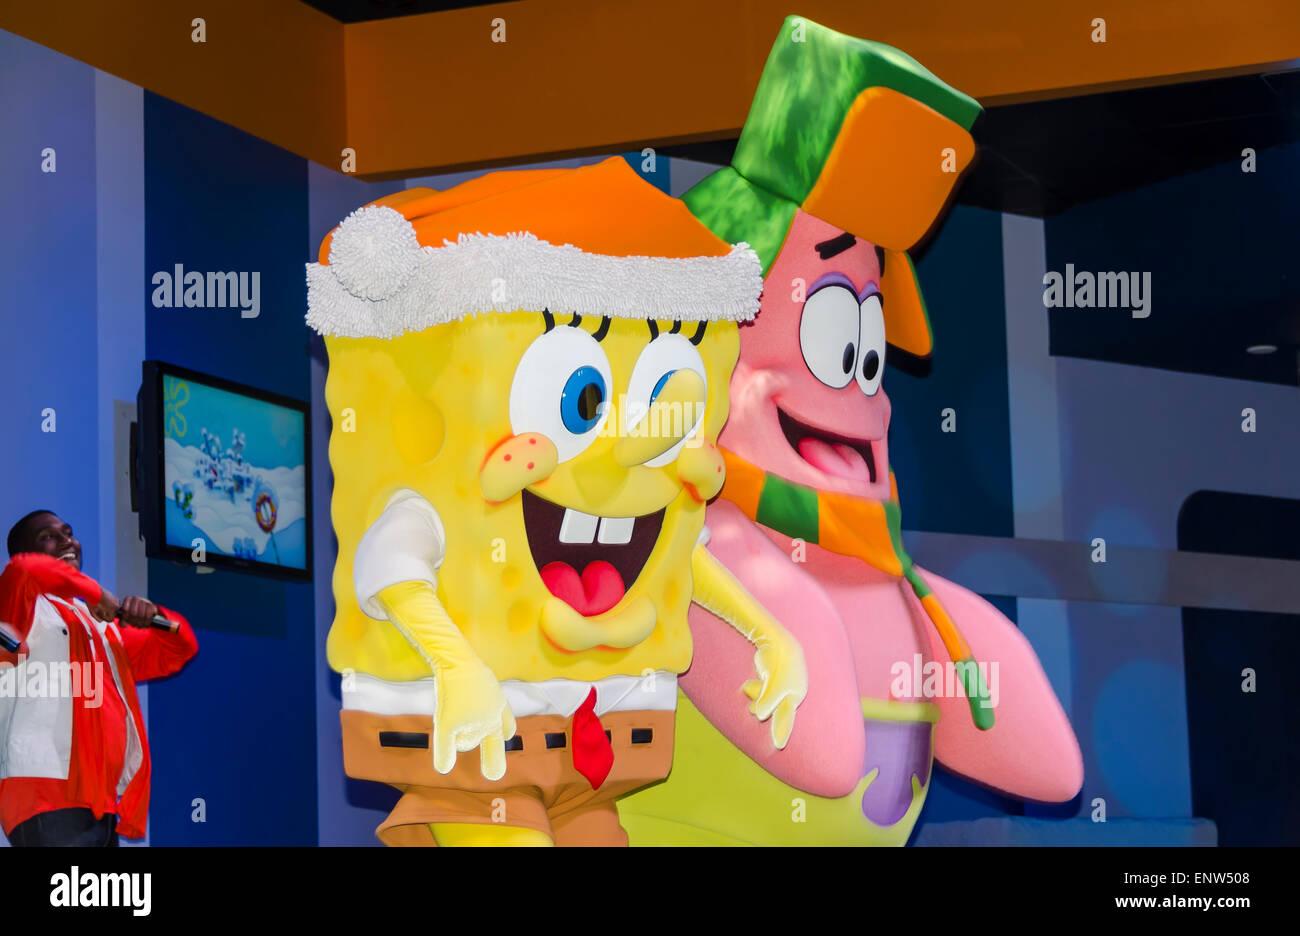 spongebob squarepants and patrick star cartoon characters stage